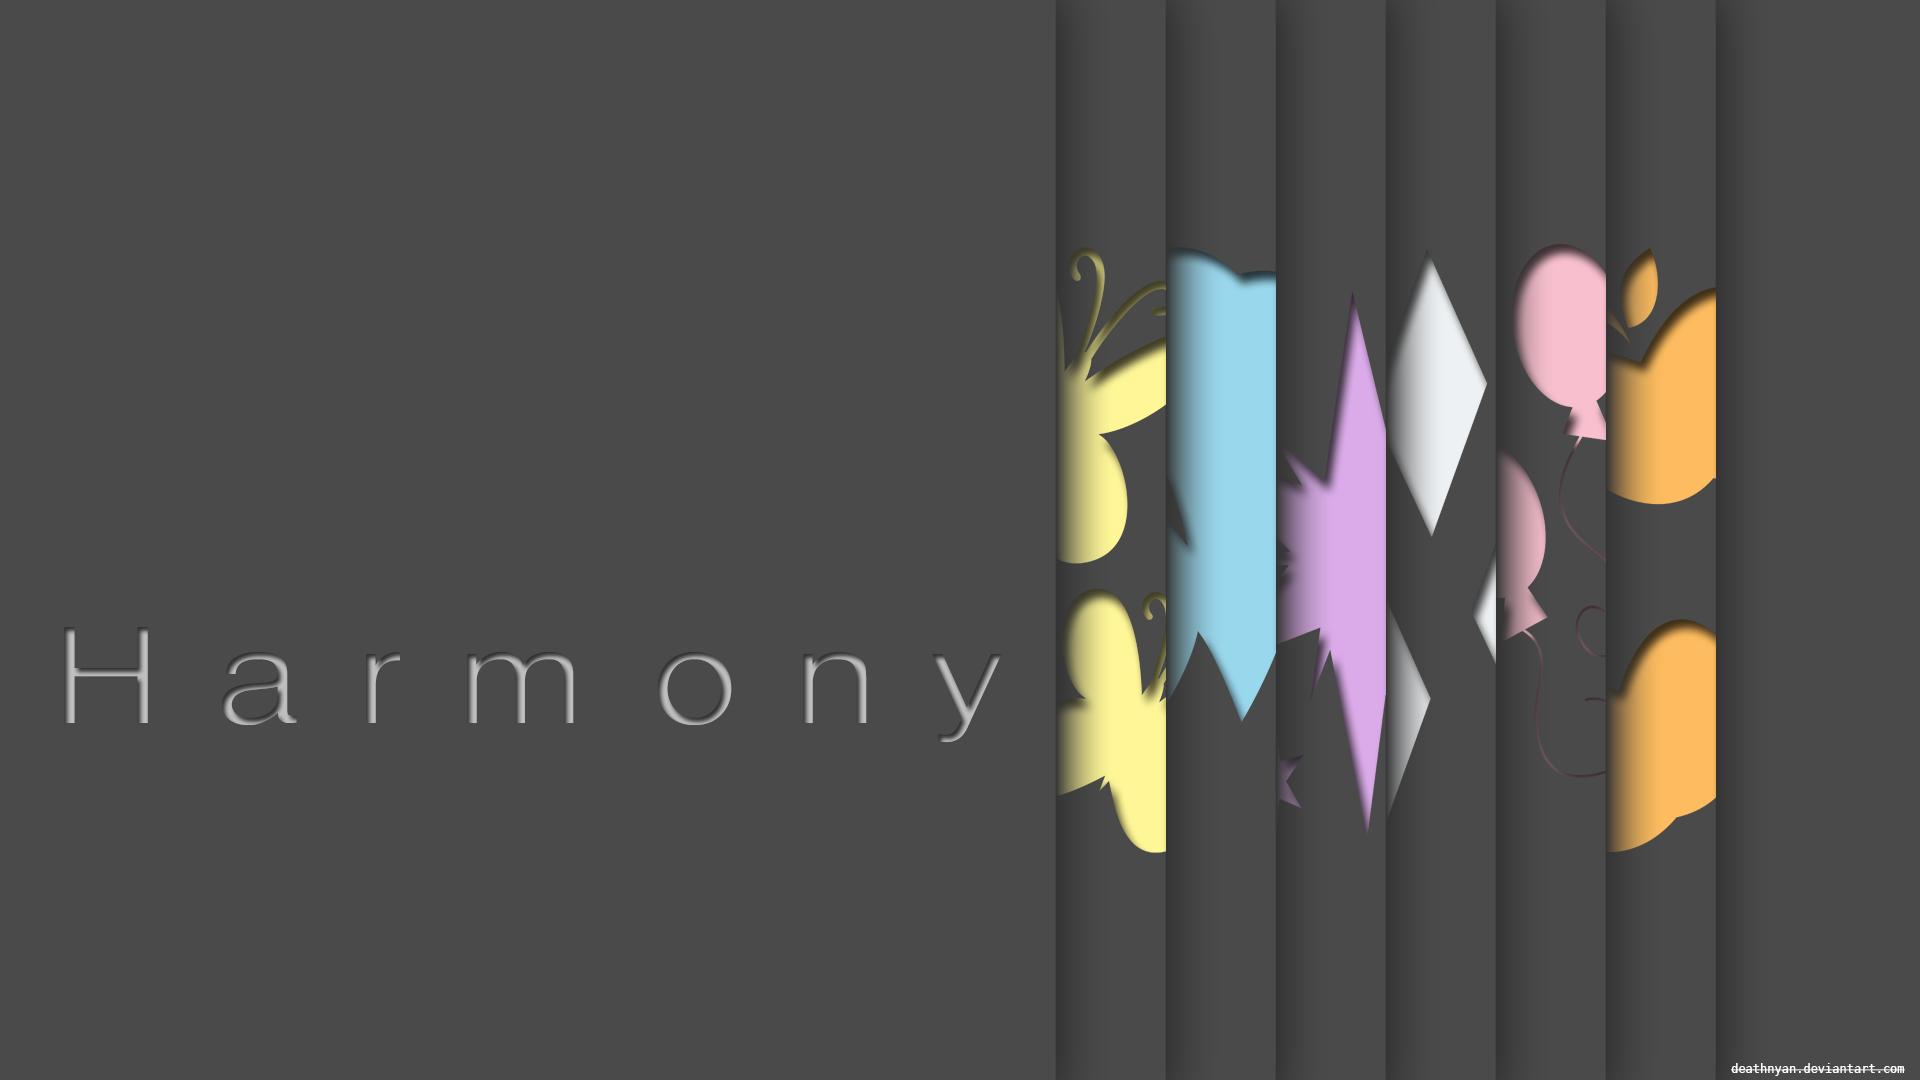 Harmony Wallpaper Minimalist Dark V2 by DeathNyan